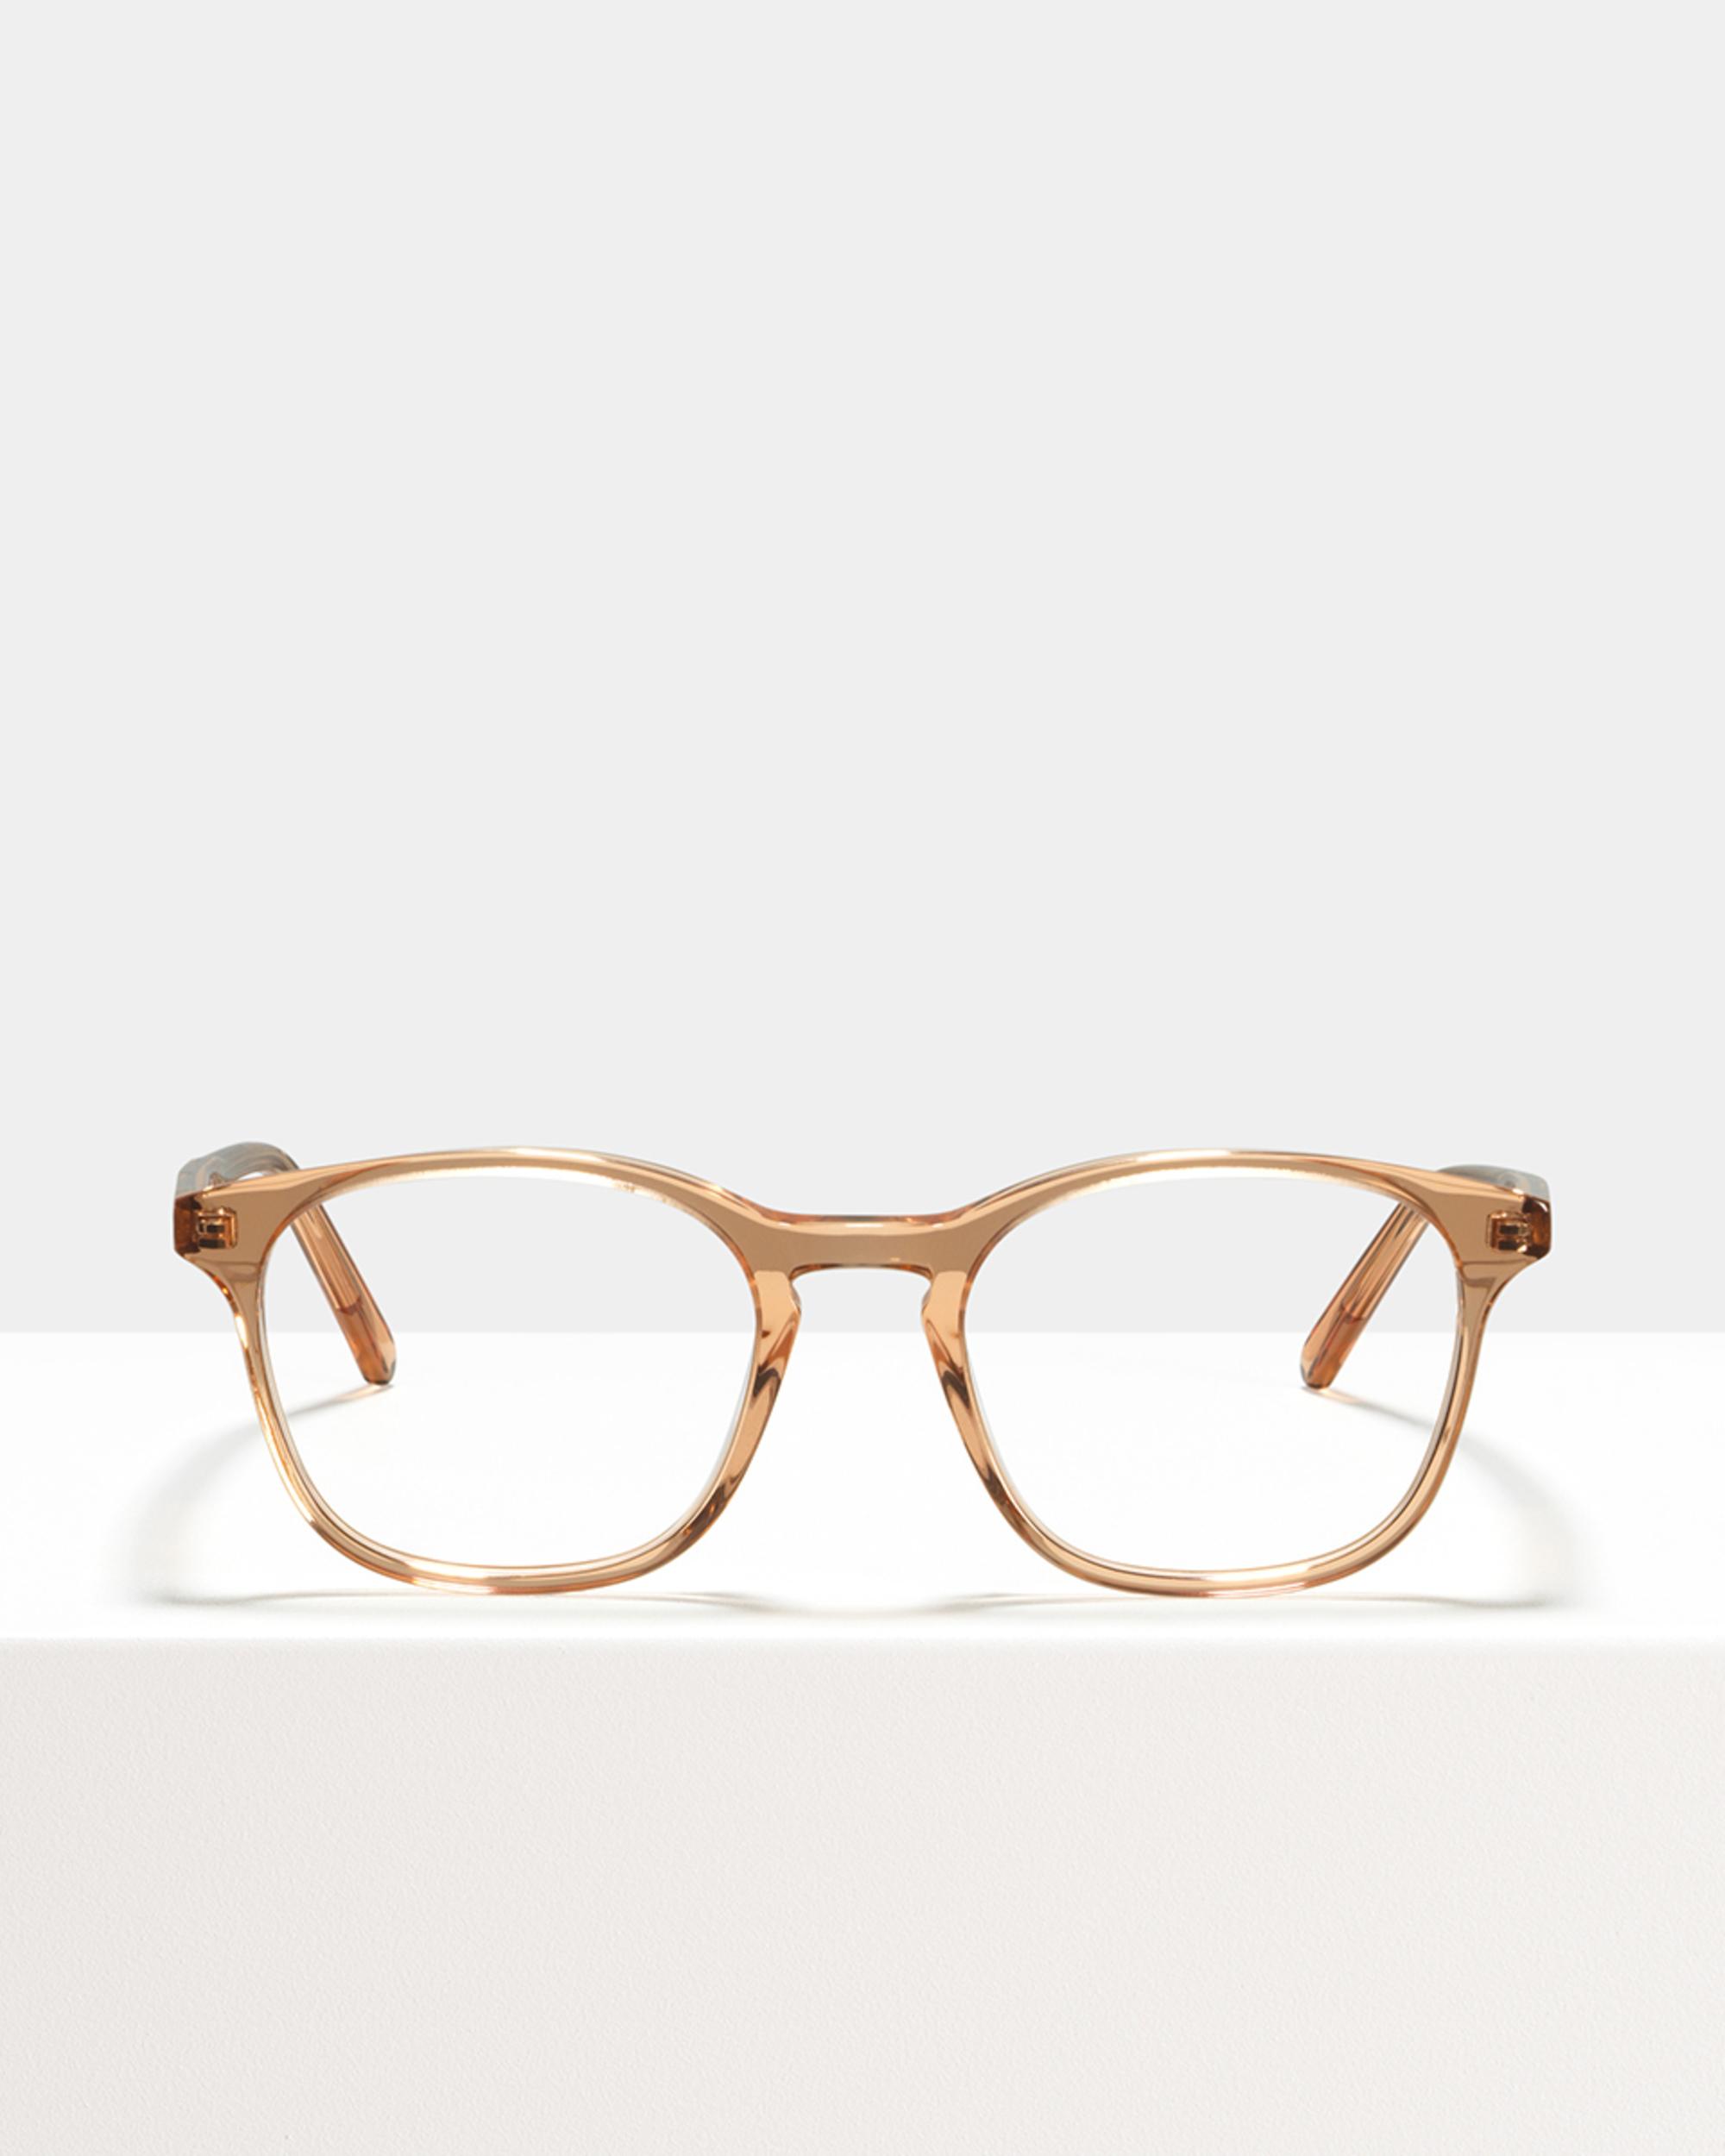 Ace & Tate Glasses | square acetate in Orange